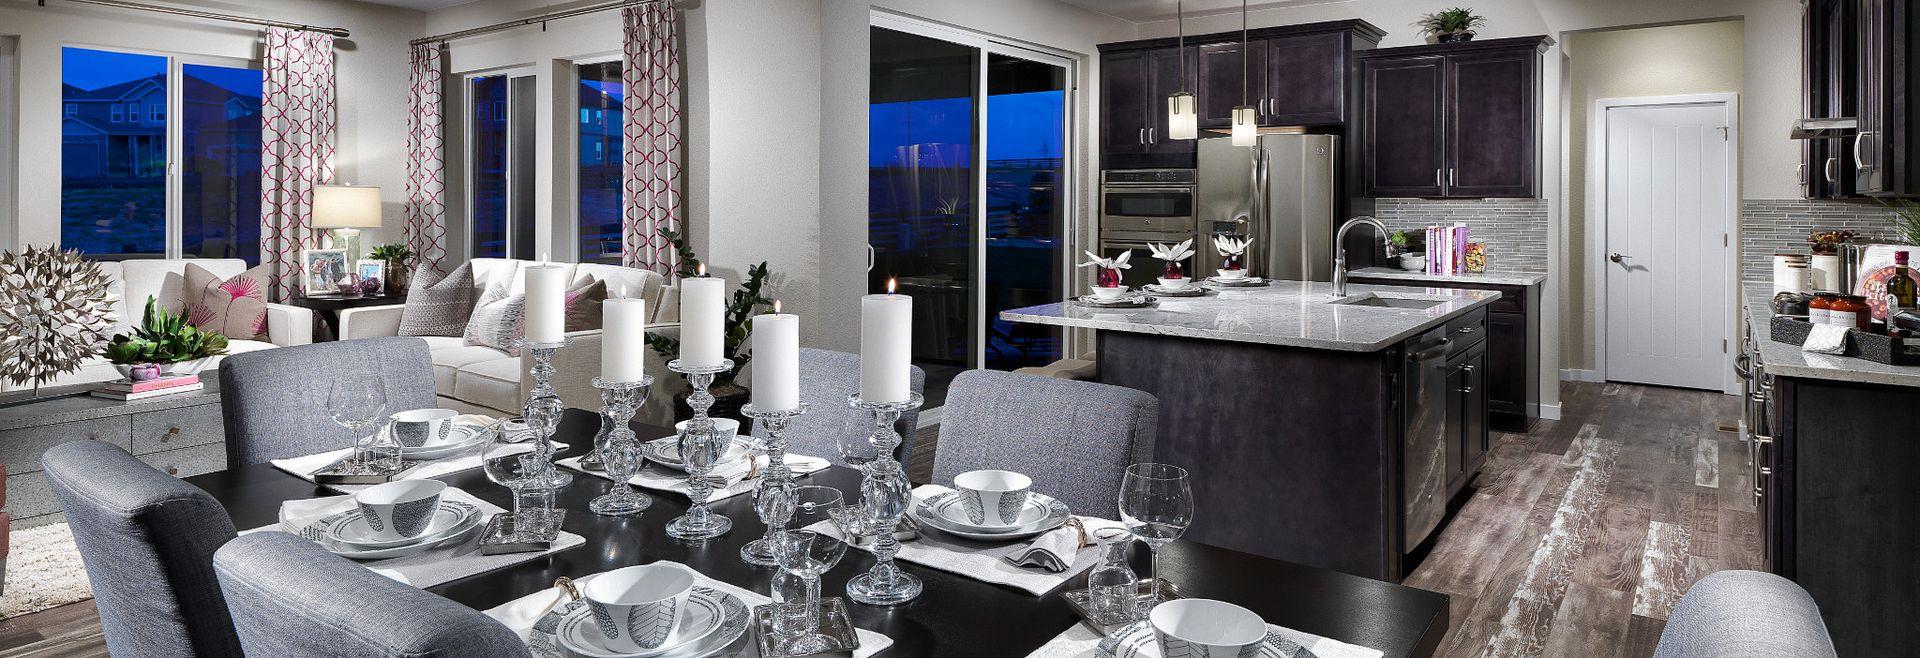 Colliers Hill Shea3D Plan 353 Main Floor